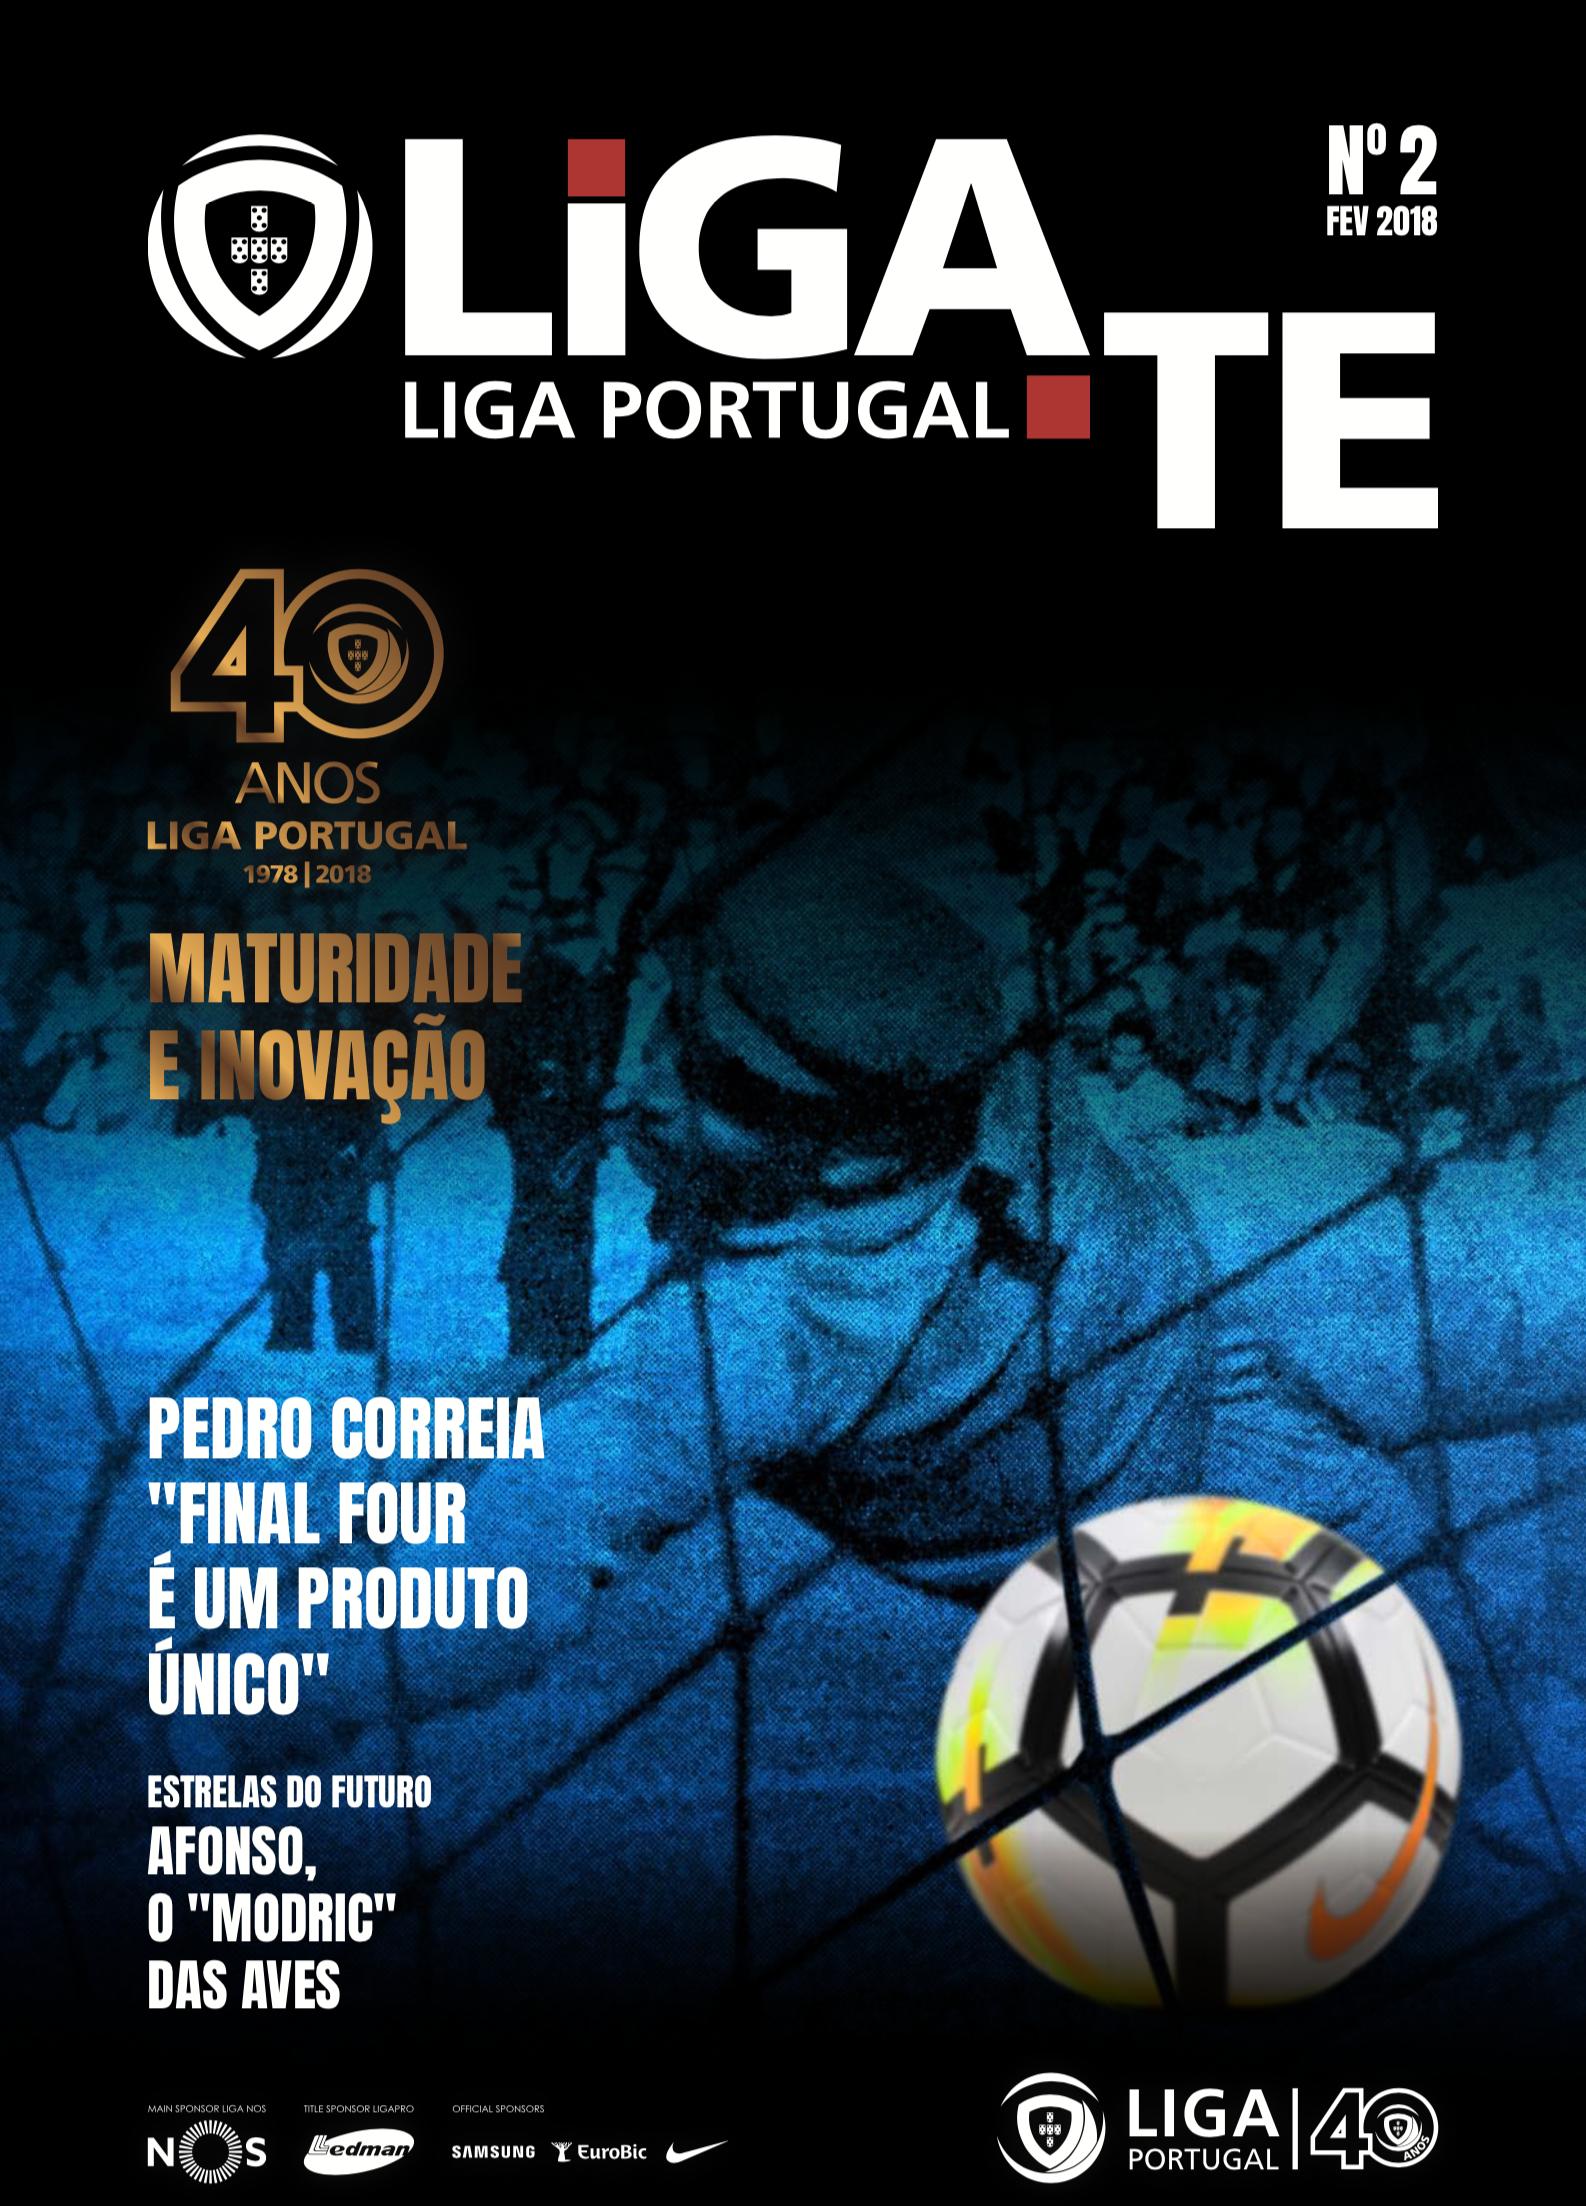 Portugal 2 Liga